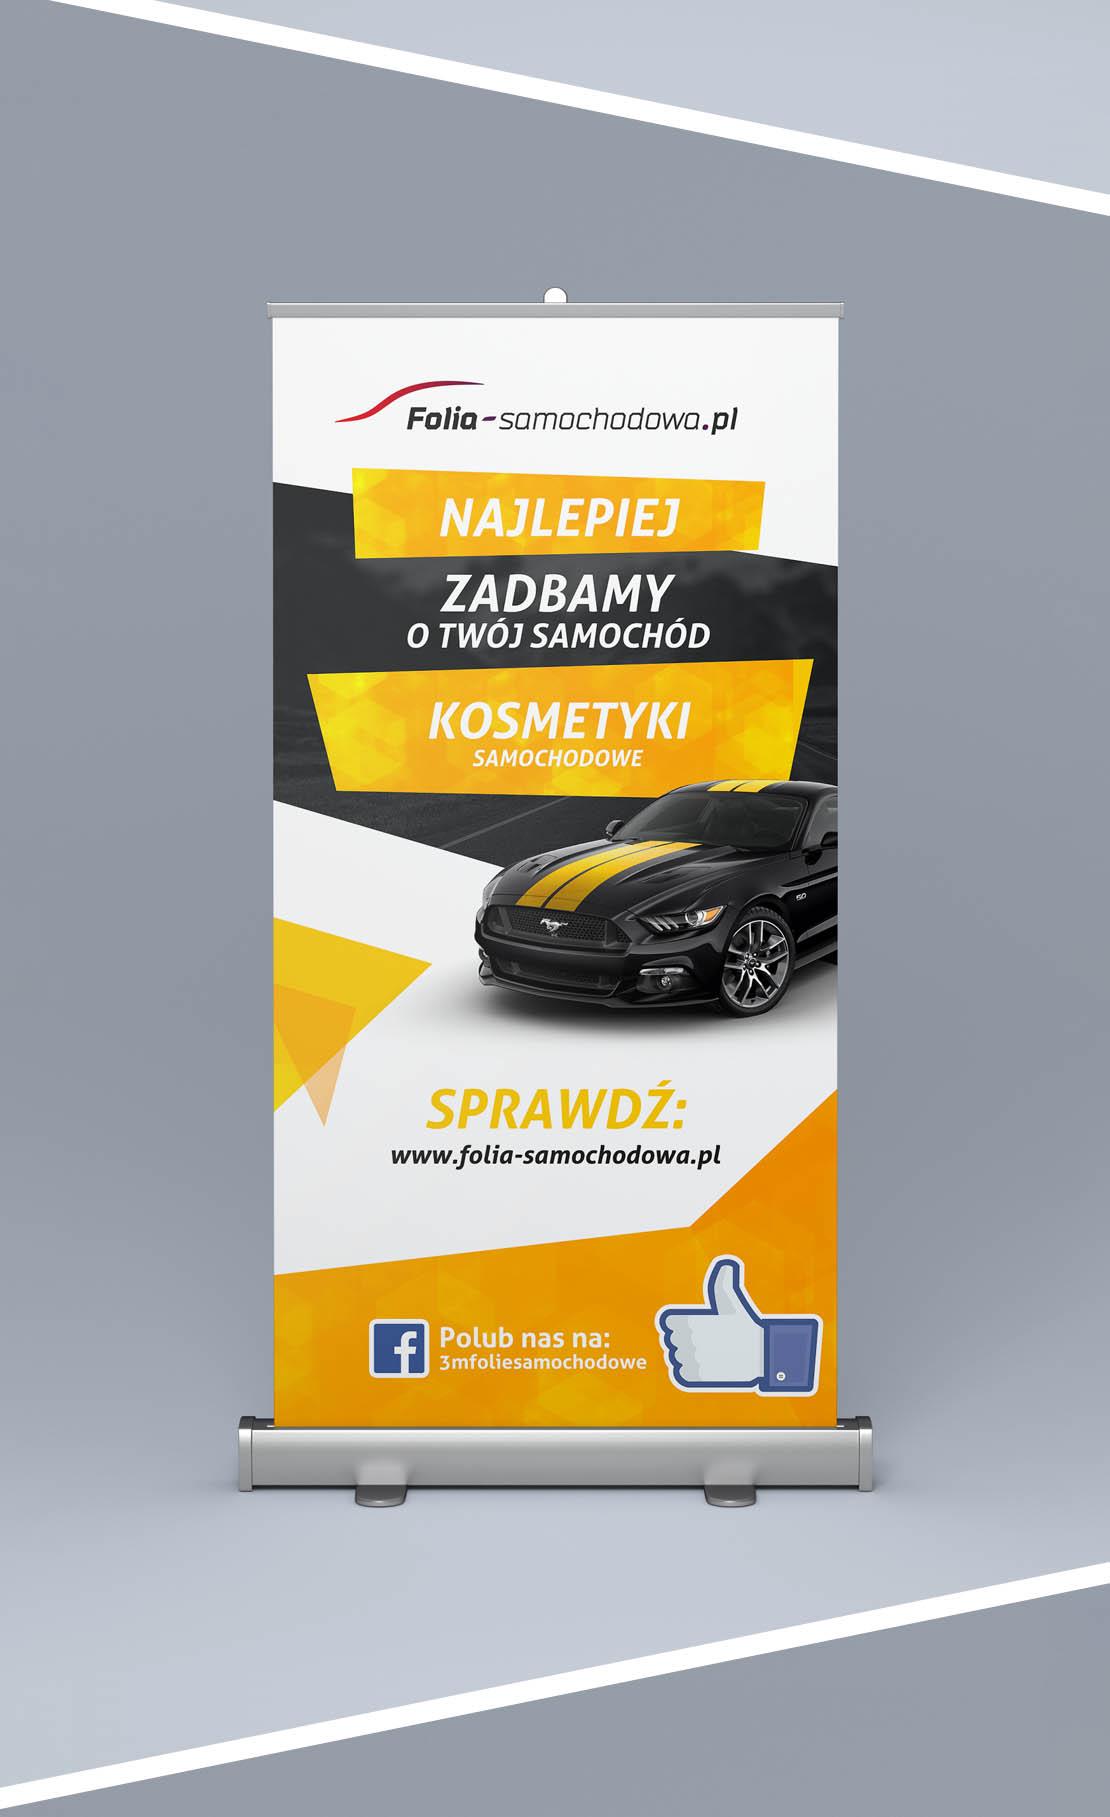 Projekt Roll Up 3M Folia-samochodowa.pl wersja 2